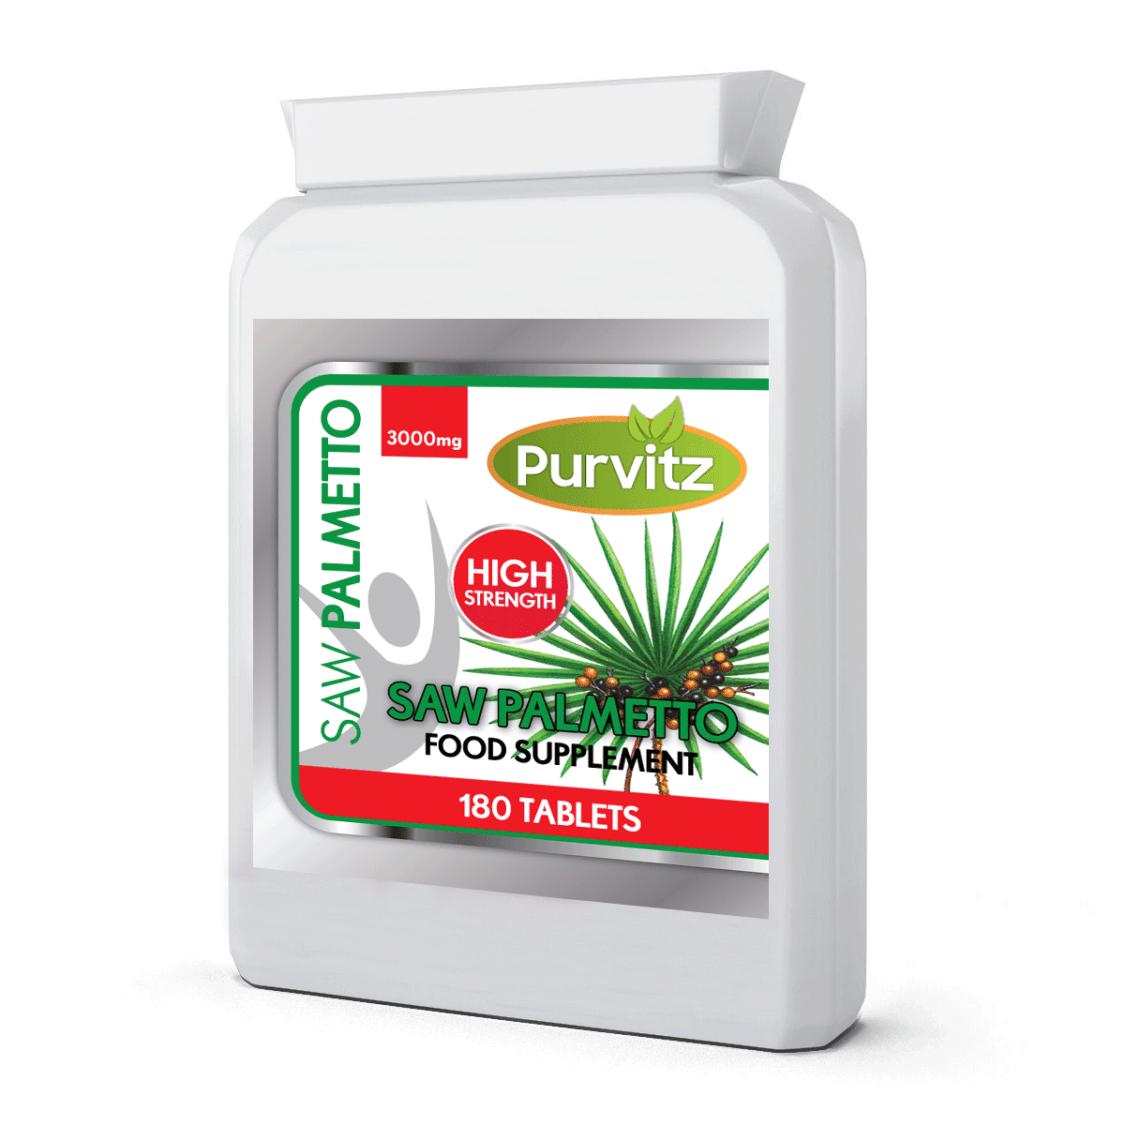 Sägepalme Extrakt 3000mg Haarausfall, Harnwege Prostata 180 Tabletten UK